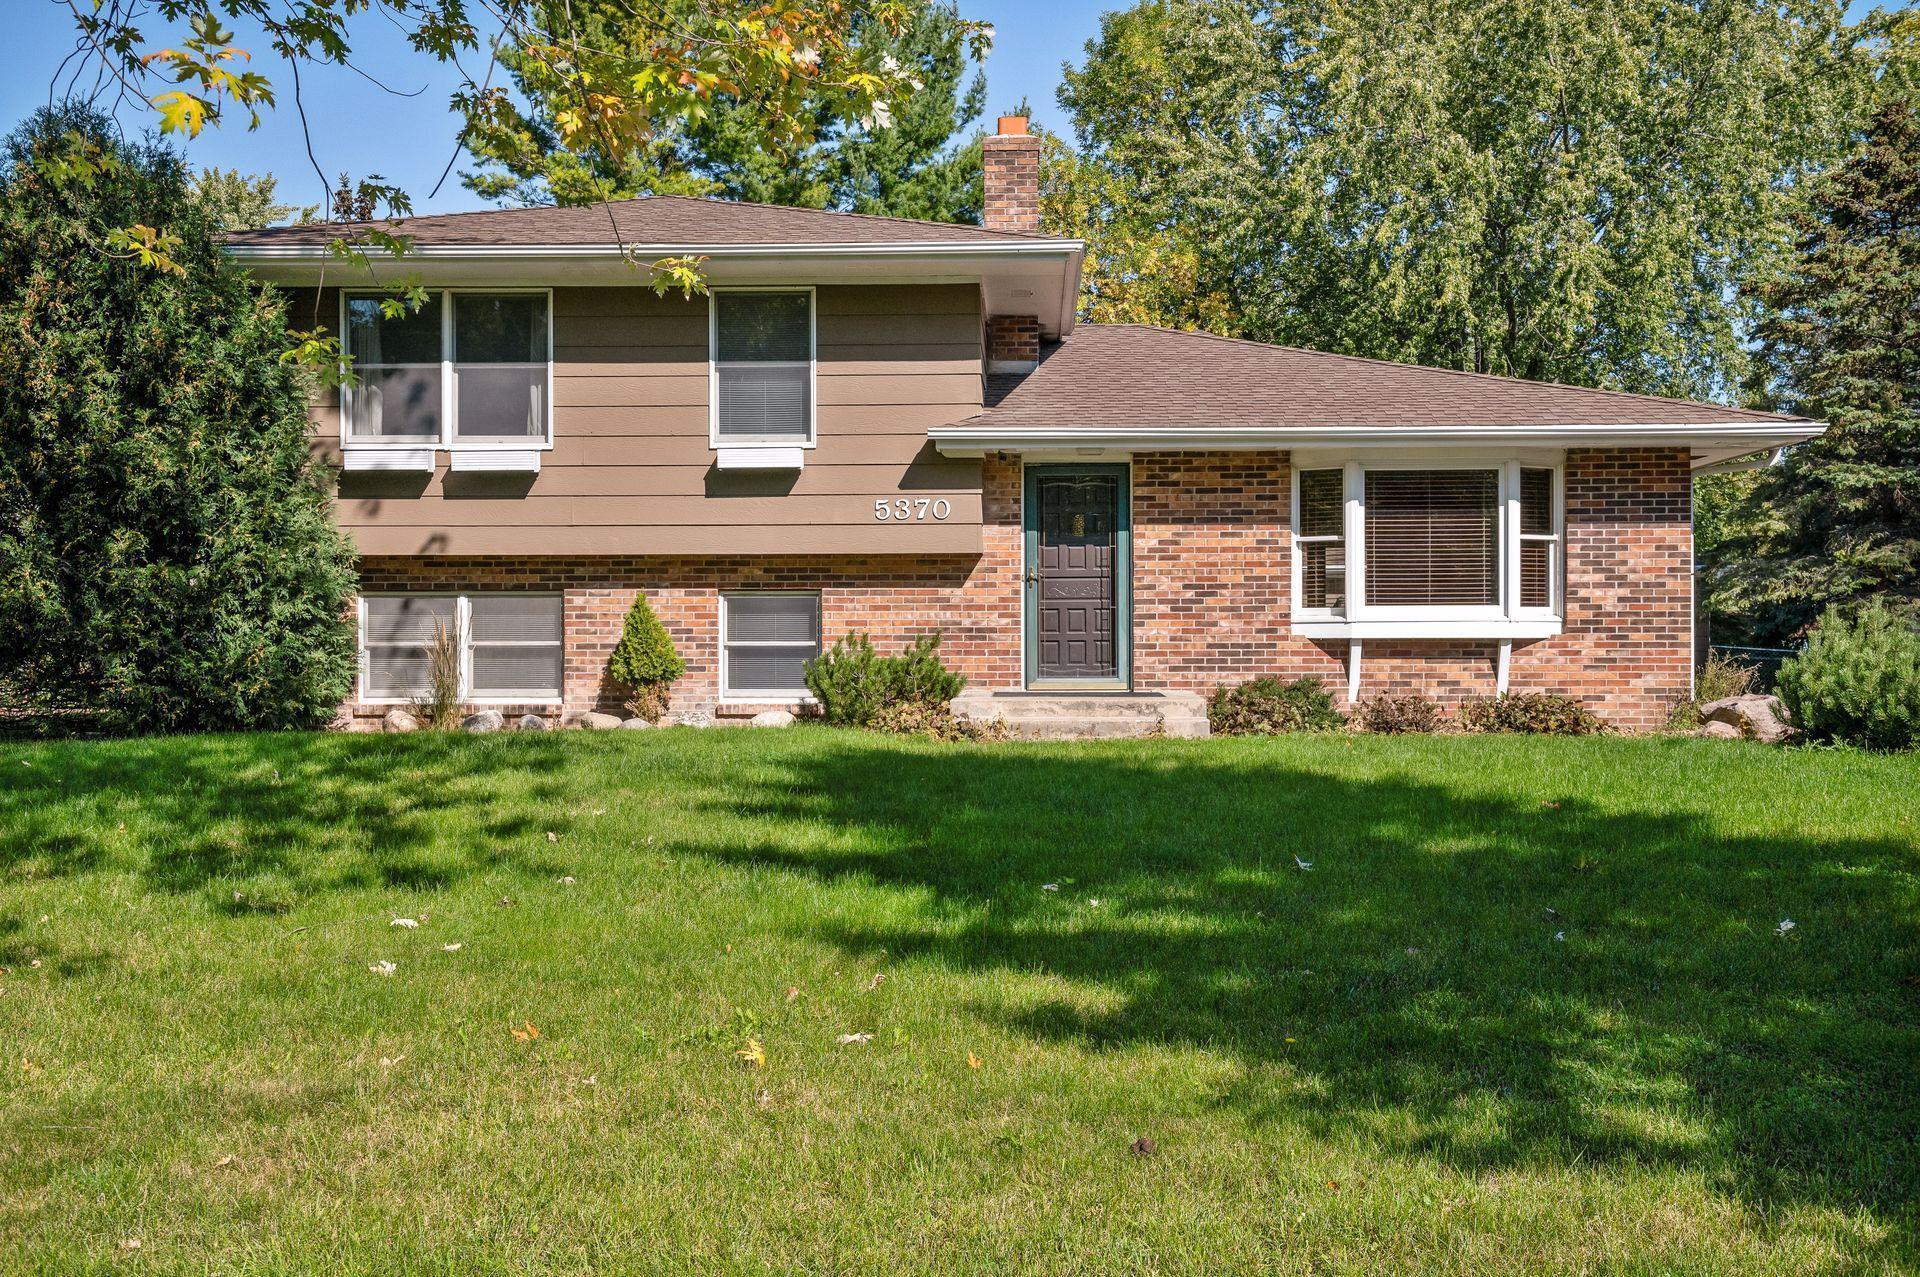 5370 Clayton Drive, Maple Plain, MN 55359